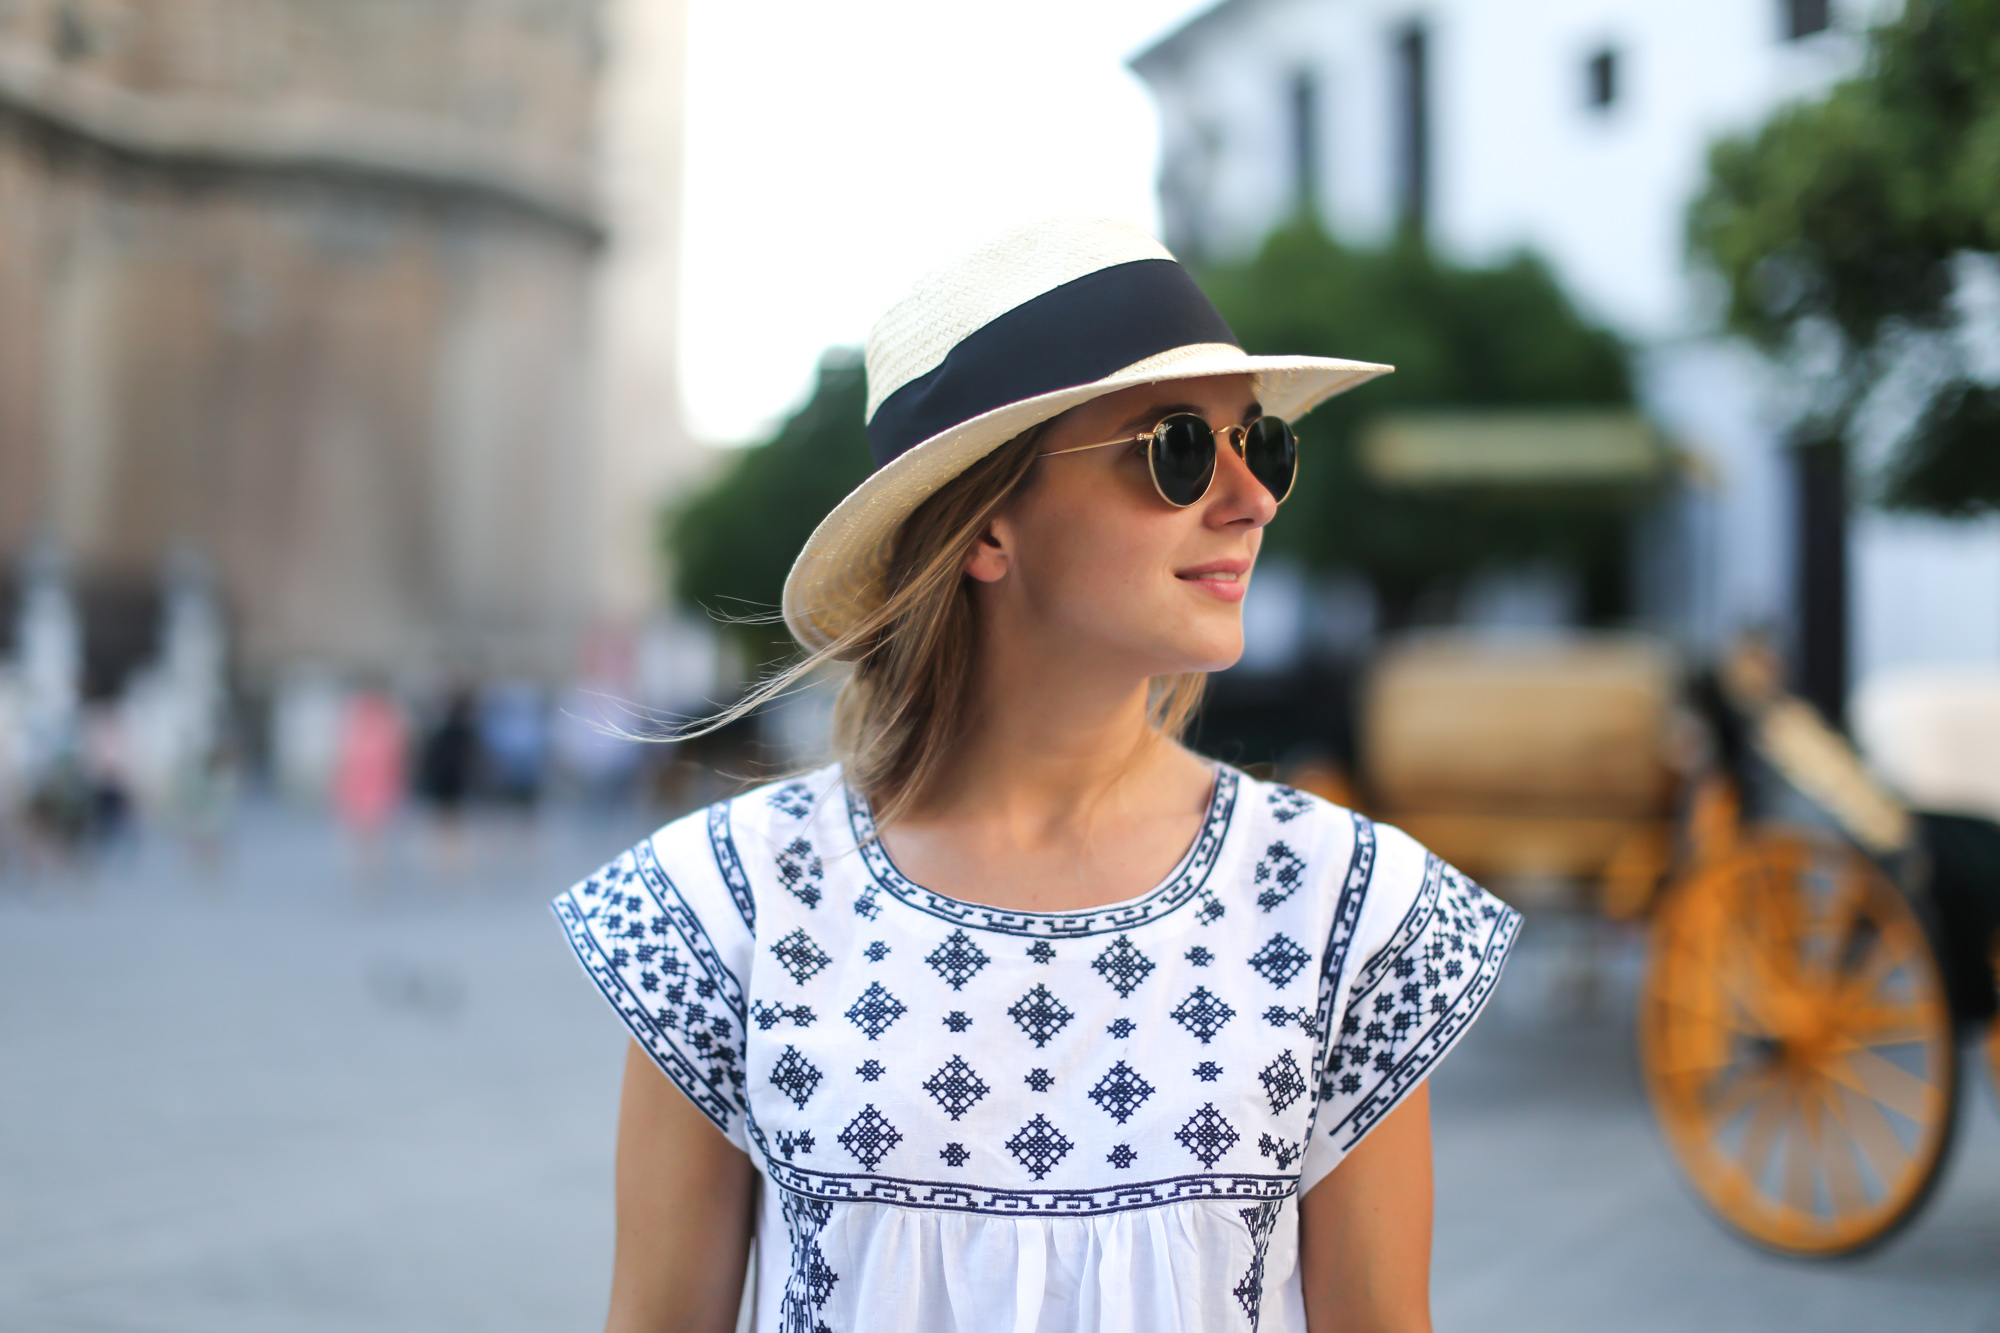 Clochet_streetstyle_chicwish_ethnic_boho_dress_fedora_straw_hat-3